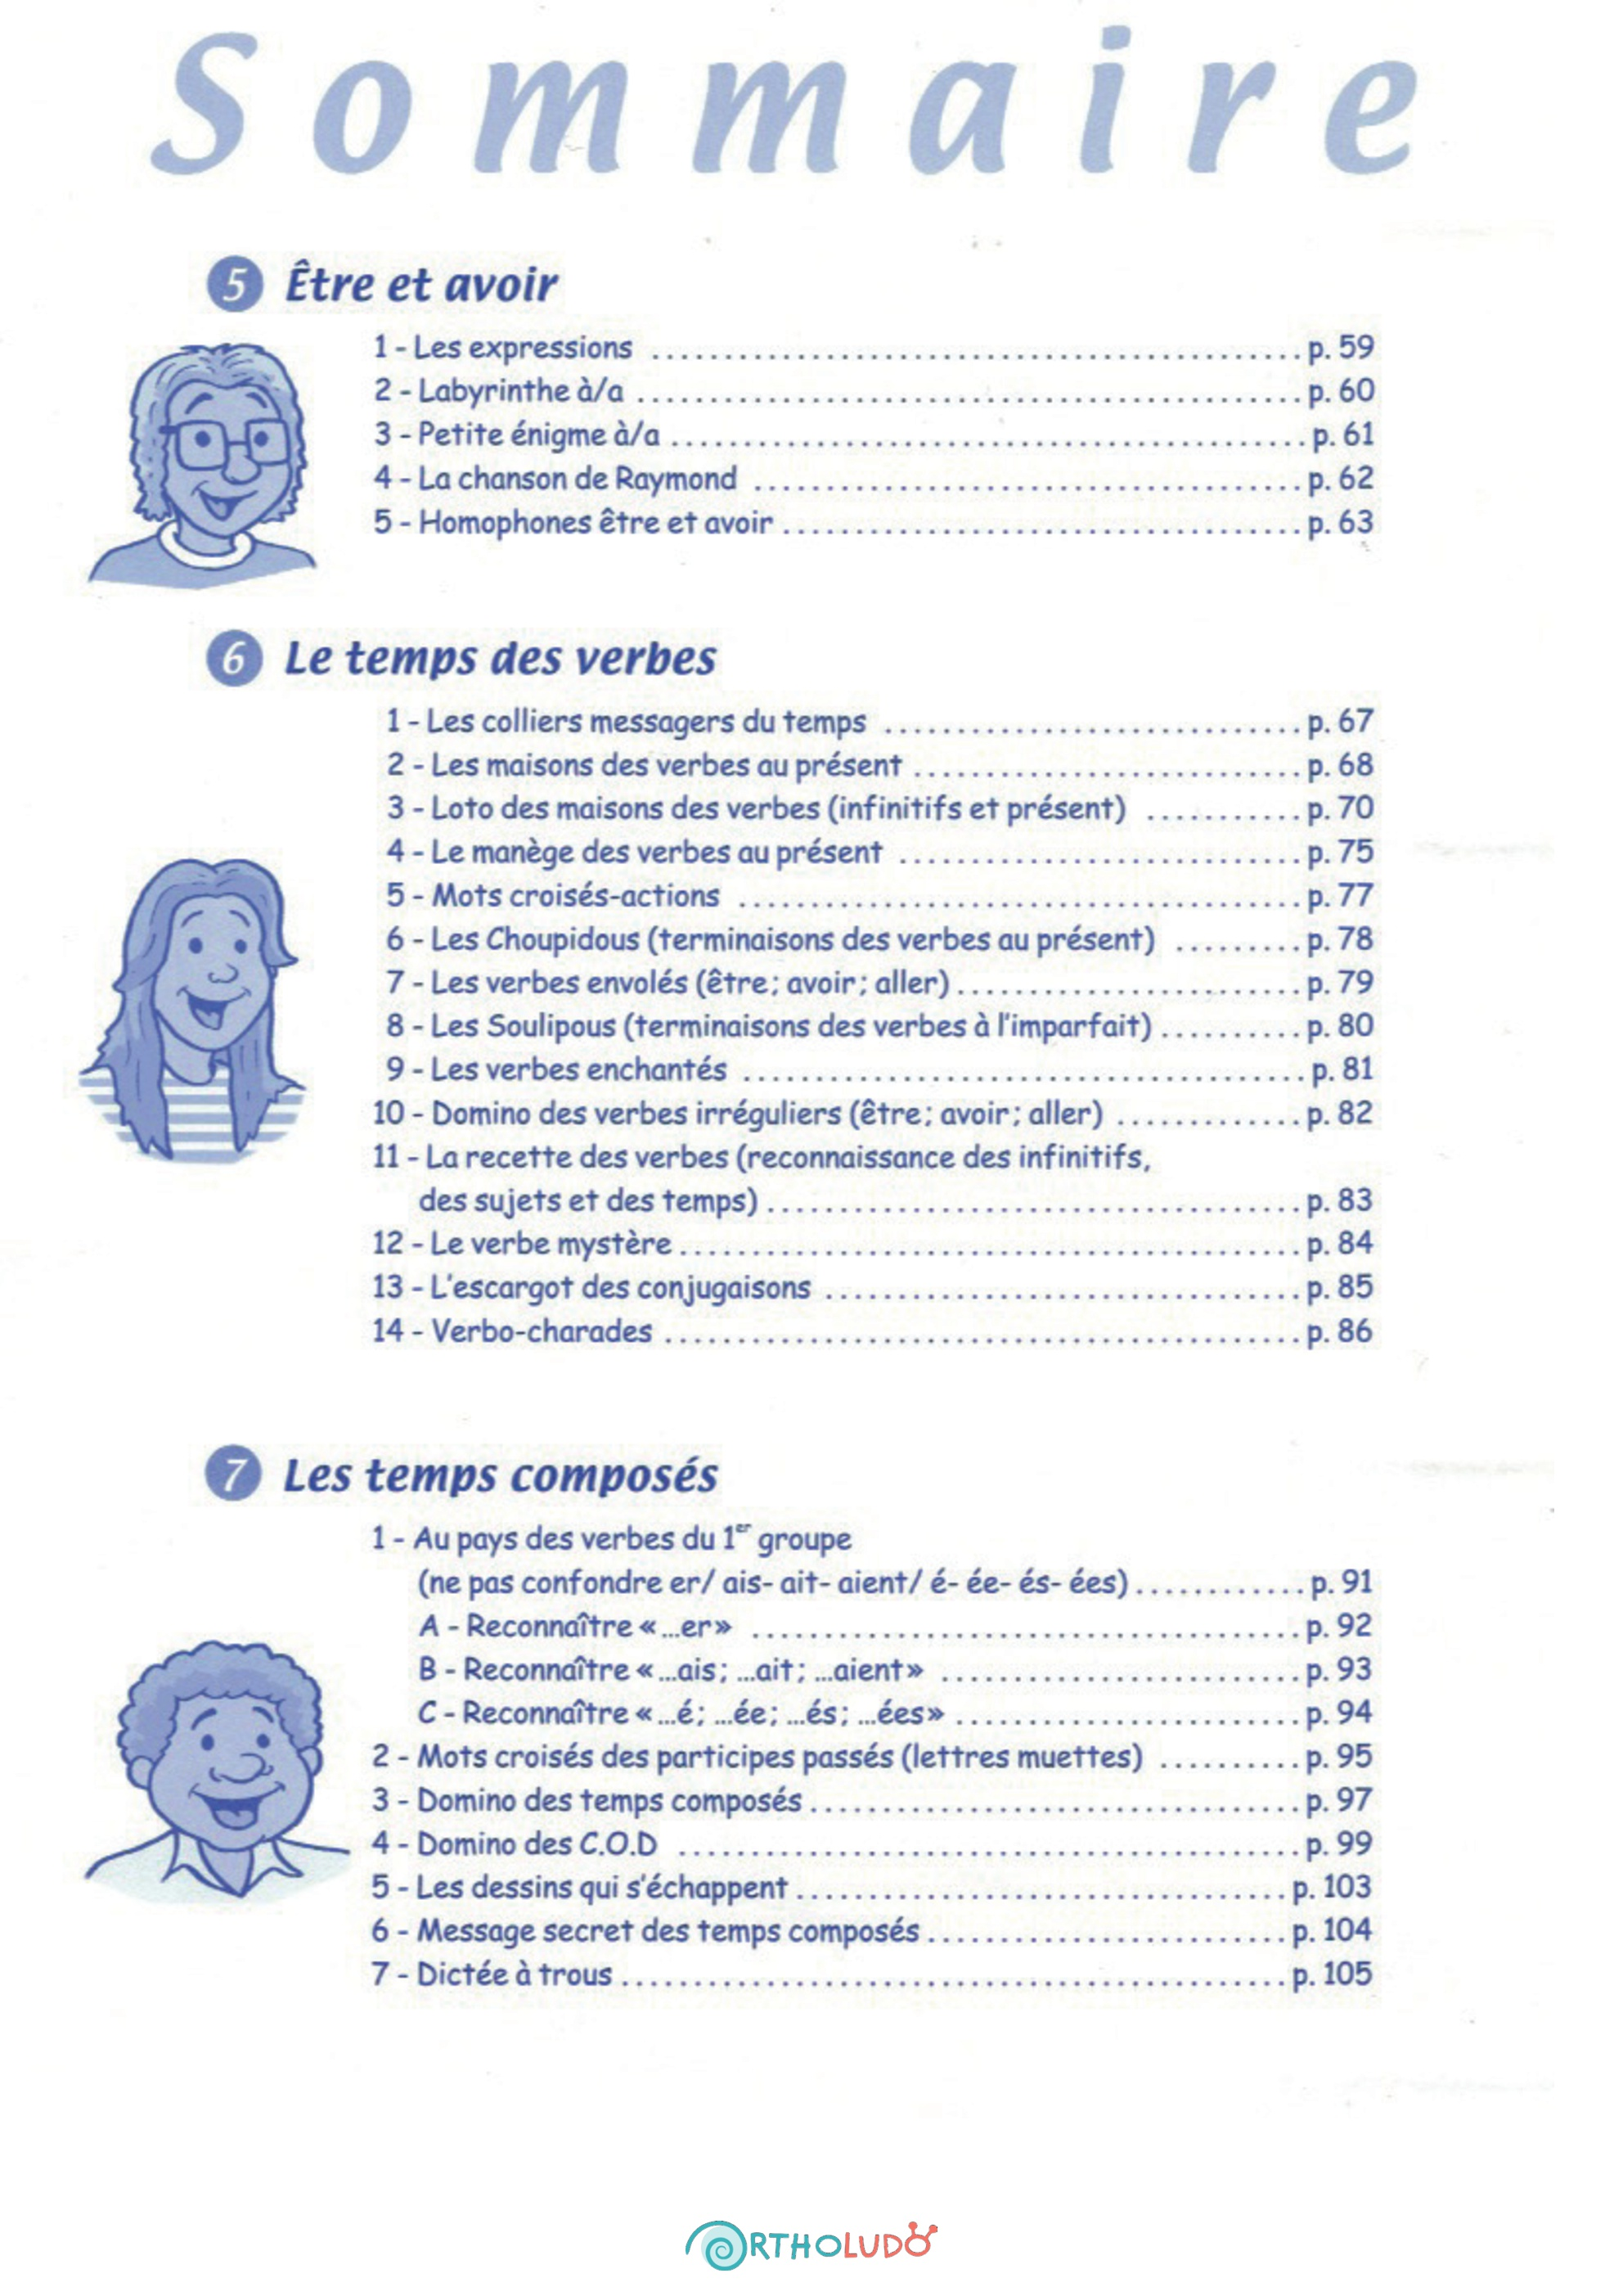 Jeu éducatif - Réflexions grammaticales - photo 3